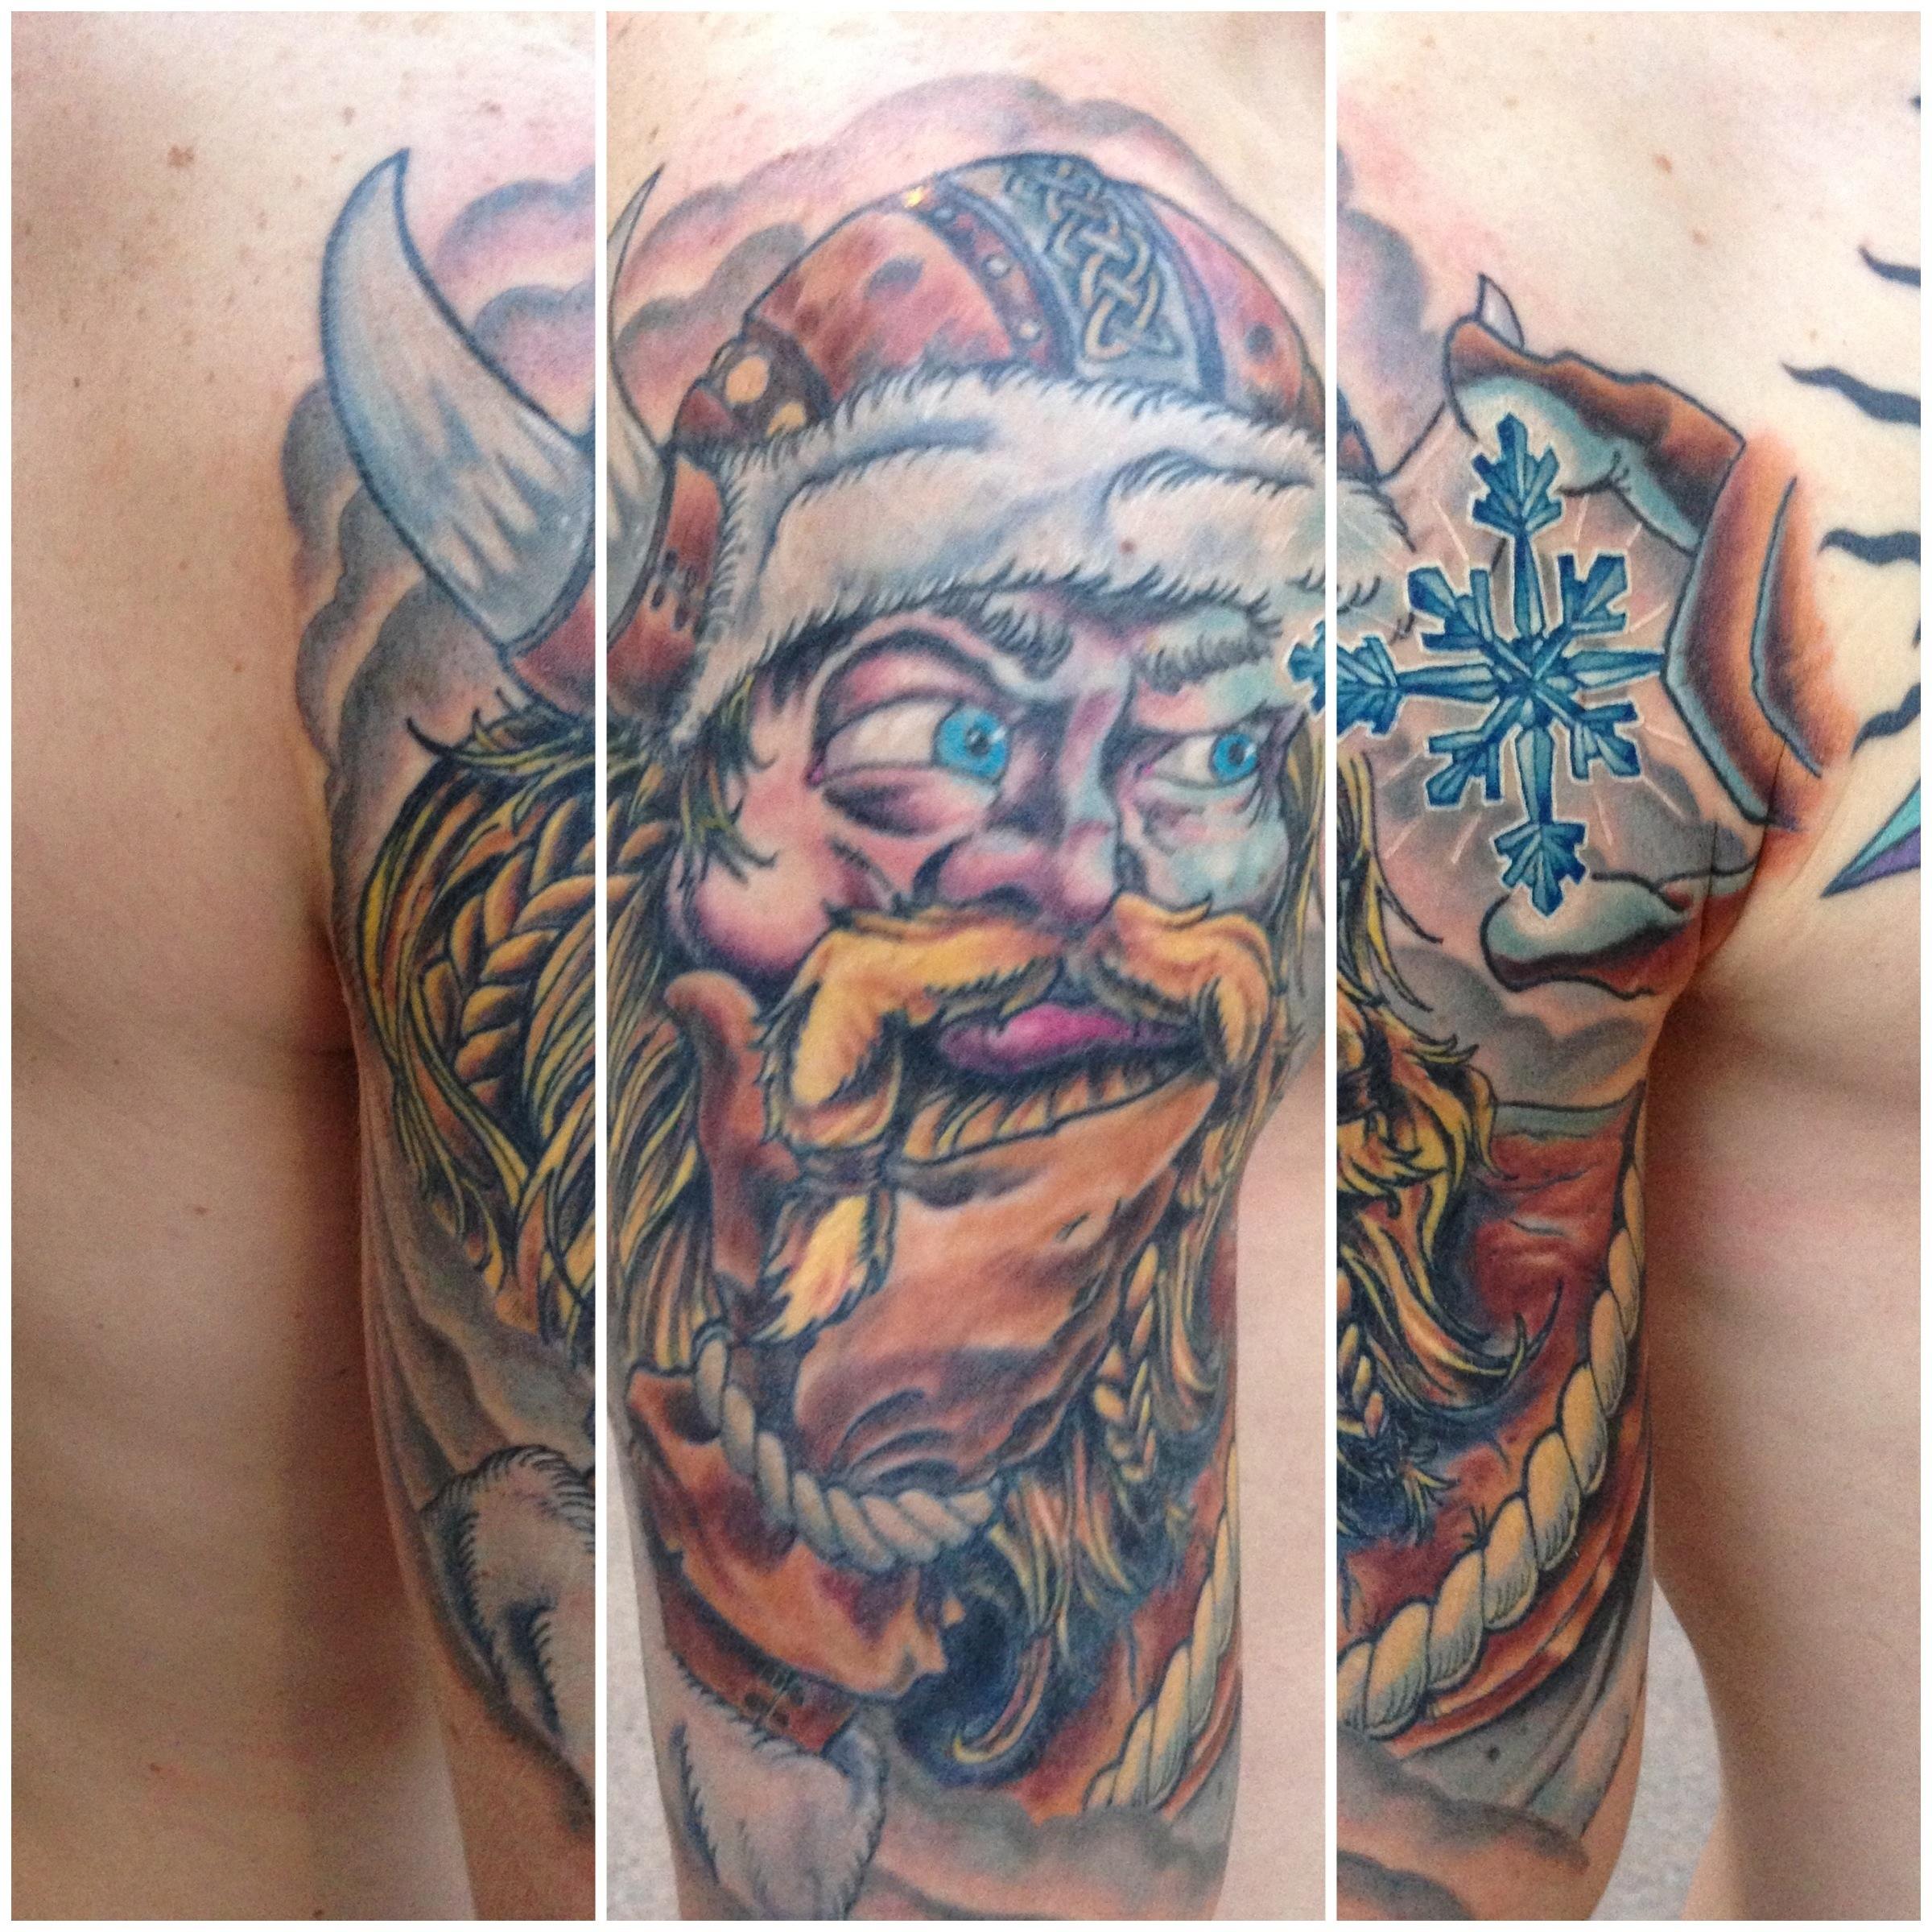 Norse half sleeve tattoos outline of ullr halfsleevein